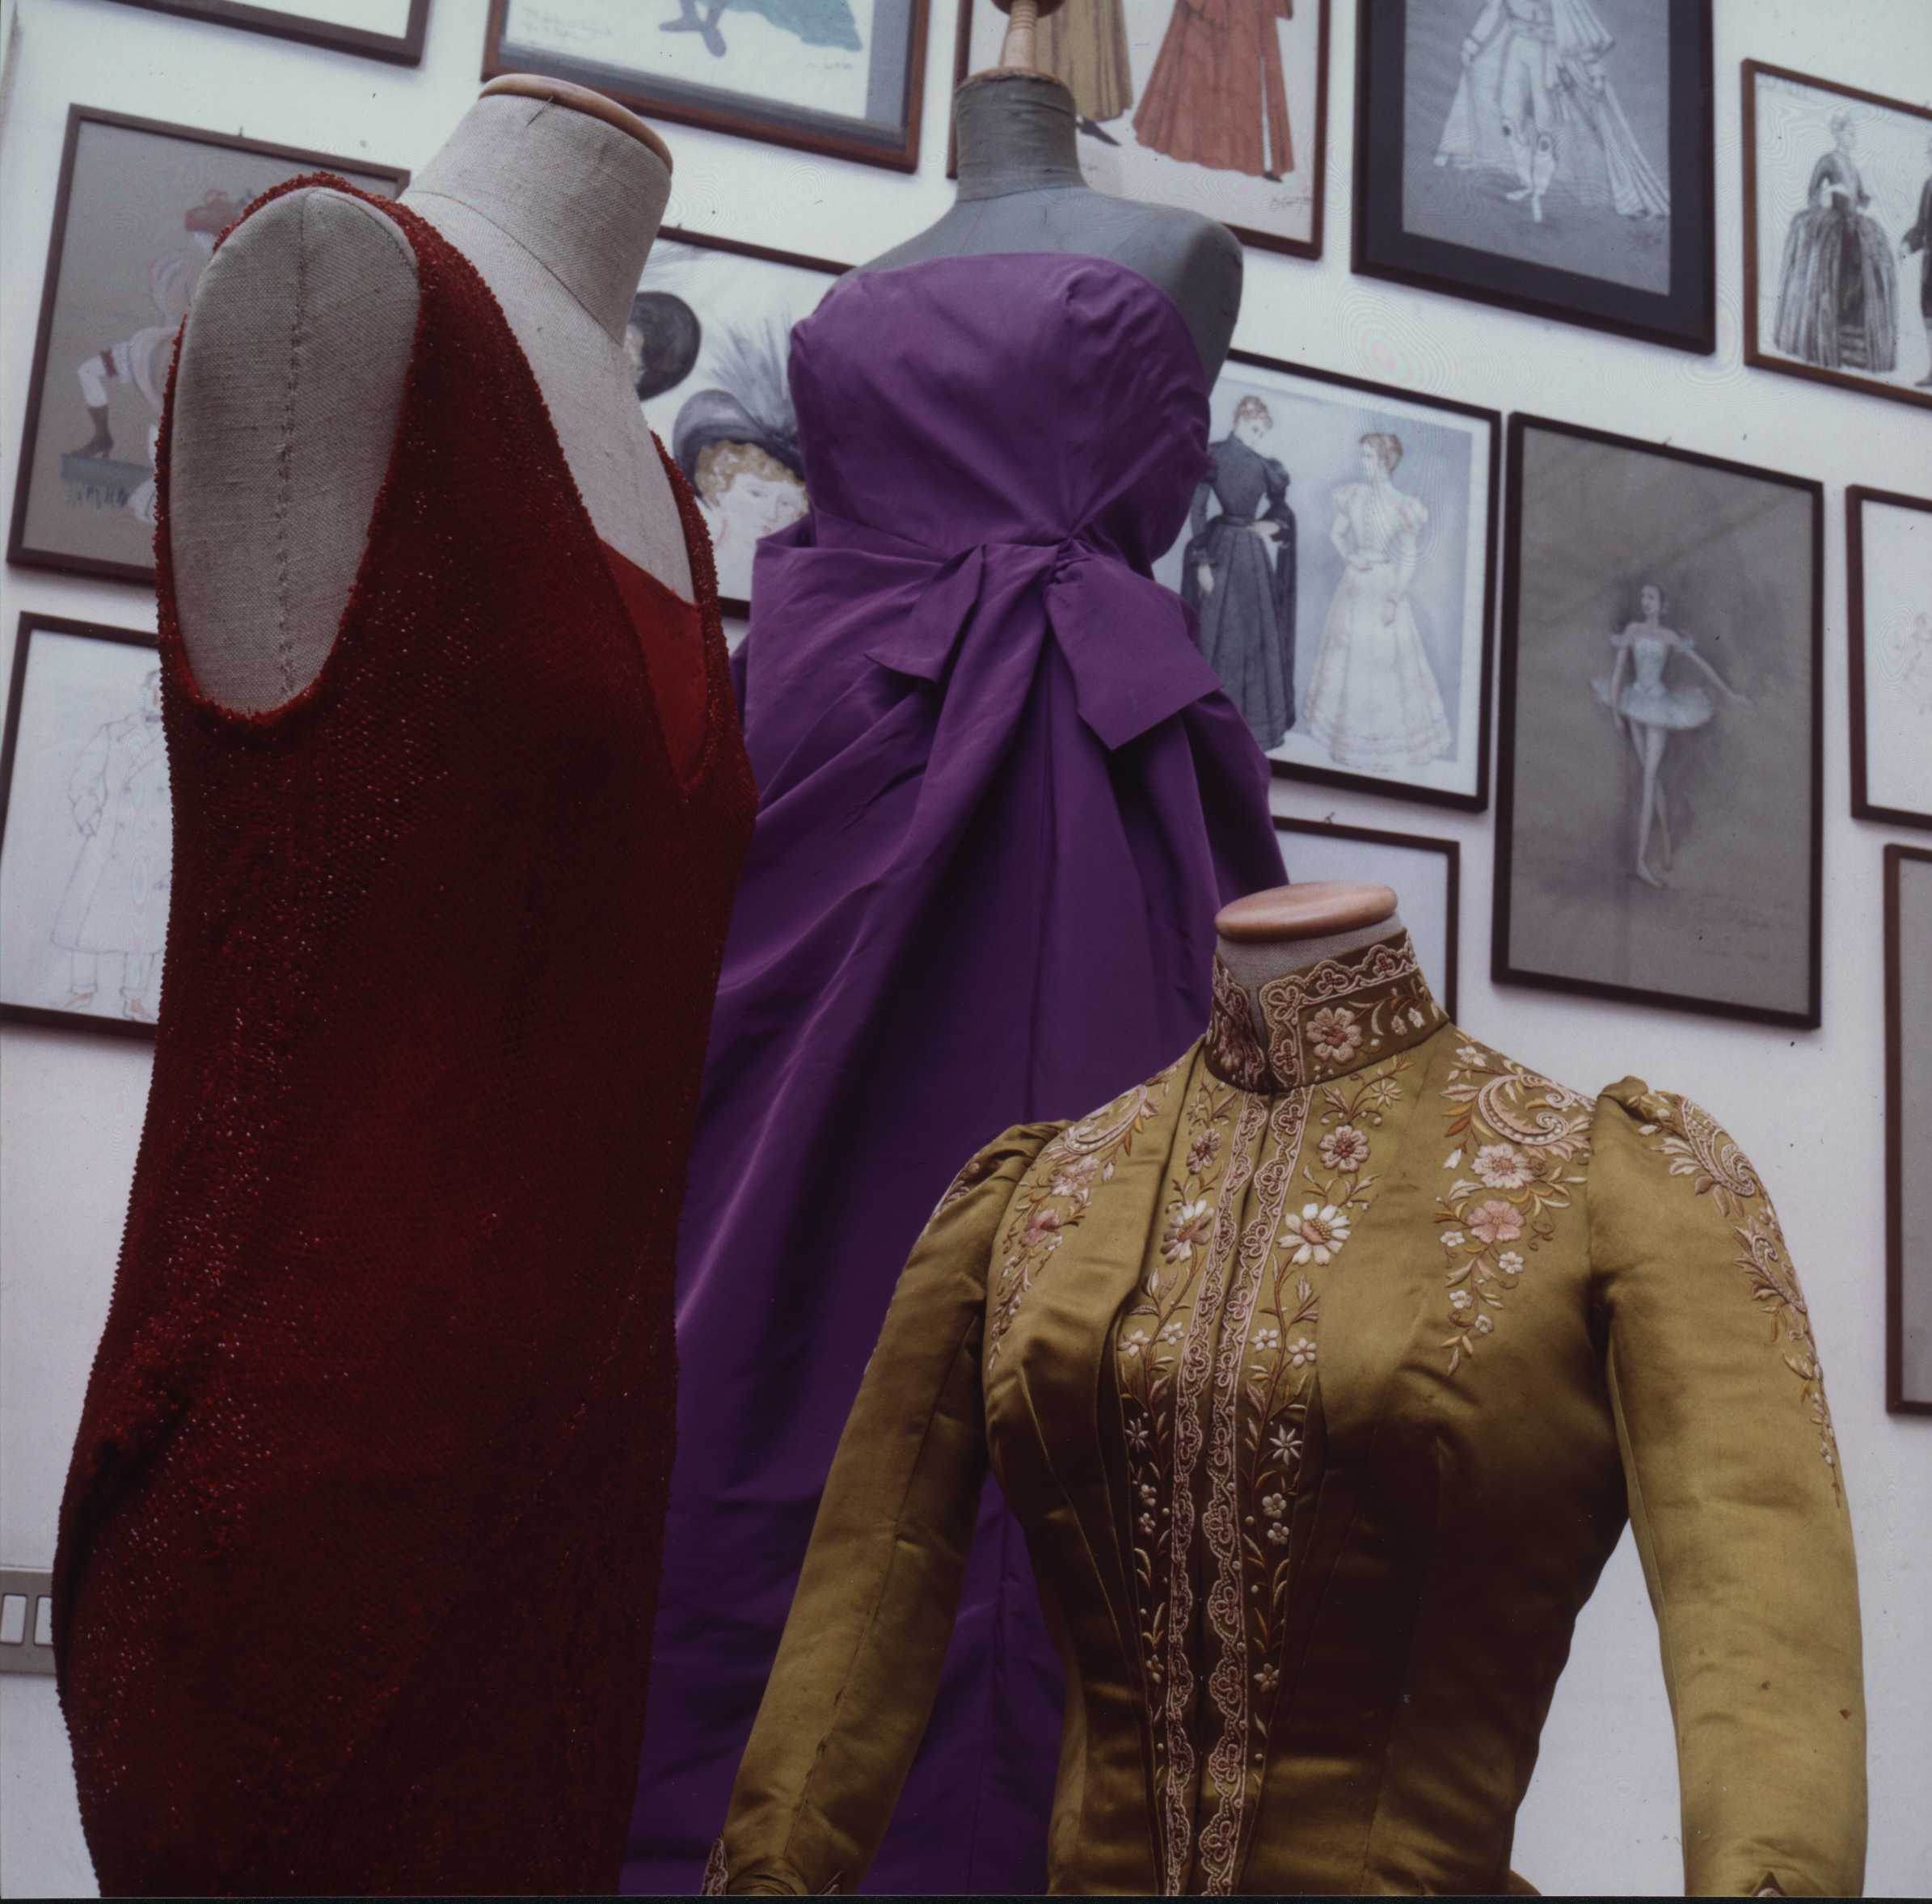 Costumi da film per Lucrezia Borgia al Teatro Verdi di Padova